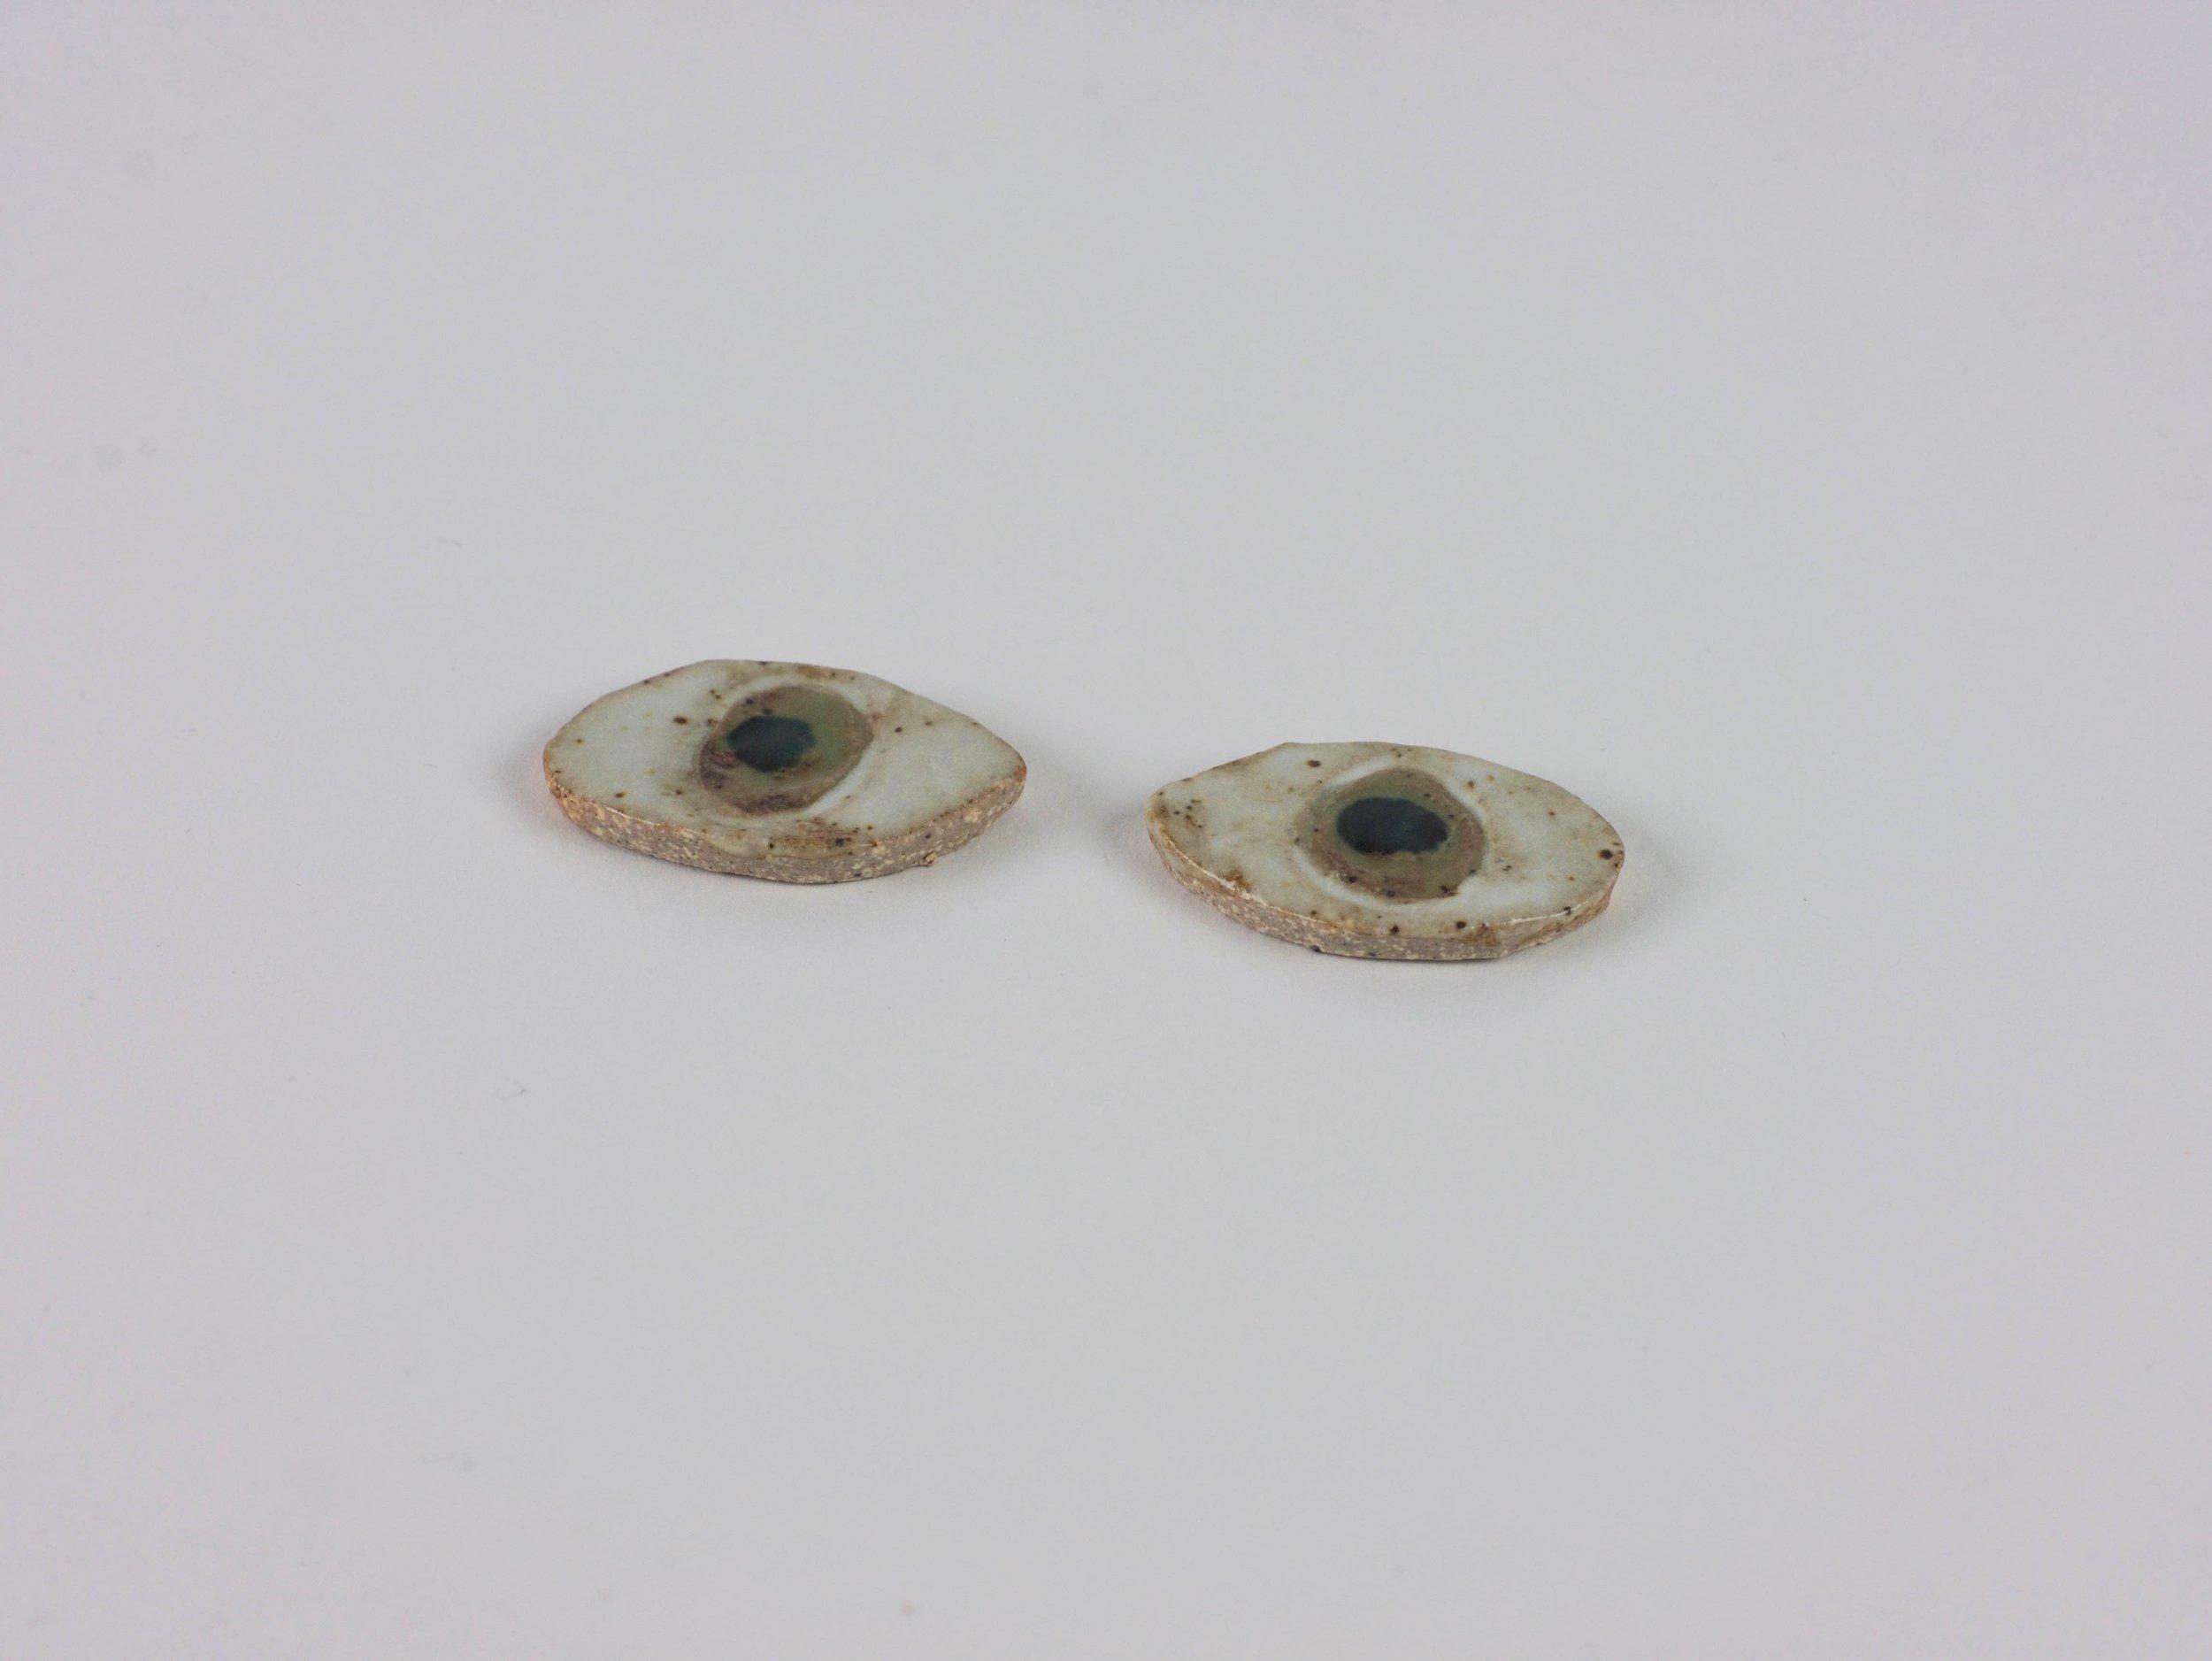 Small Eyes